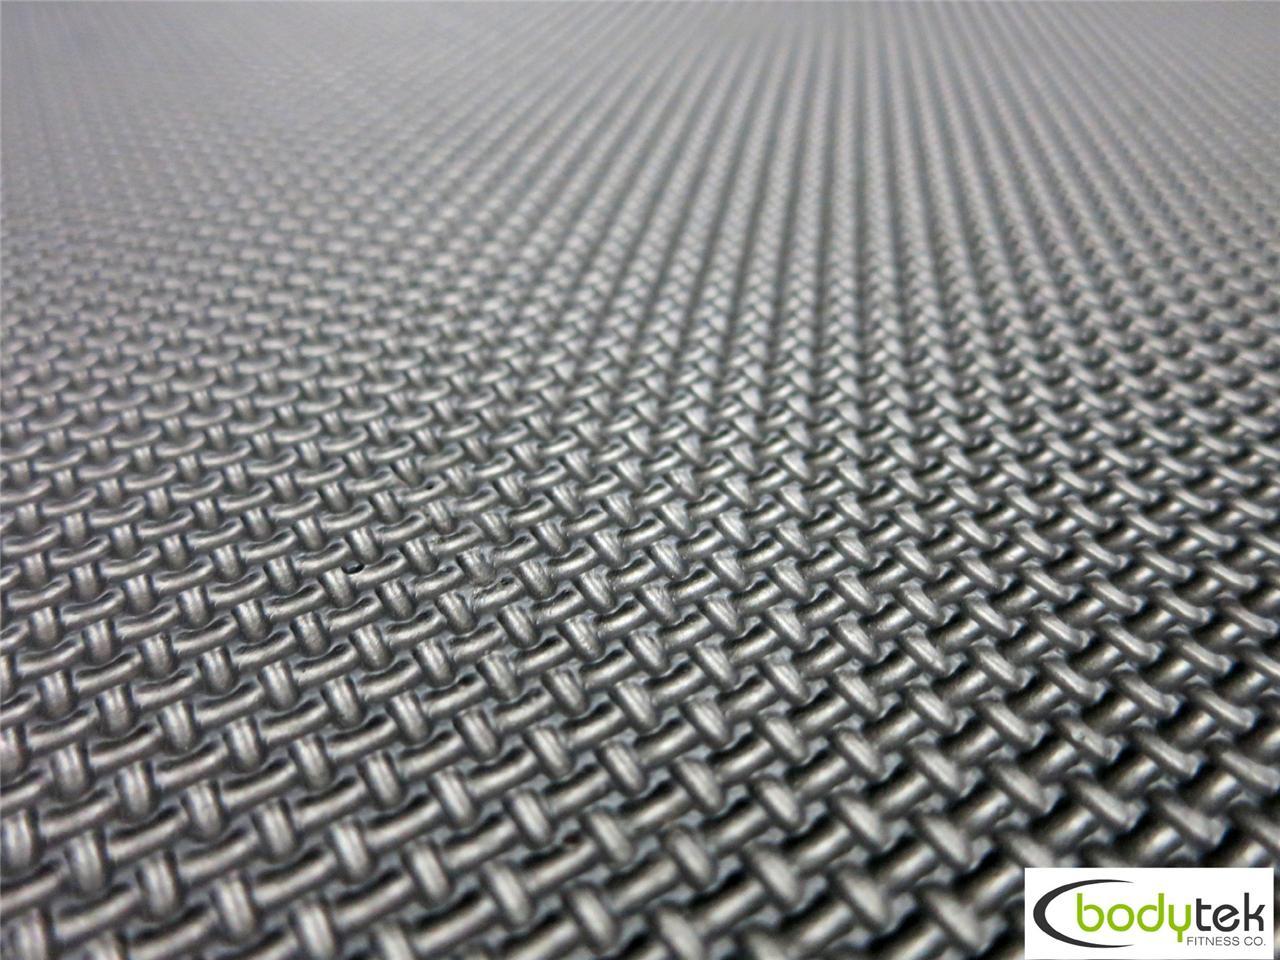 Interlocking Heavy Duty EVA Foam Gym Flooring Floor Mat Mats Tiles